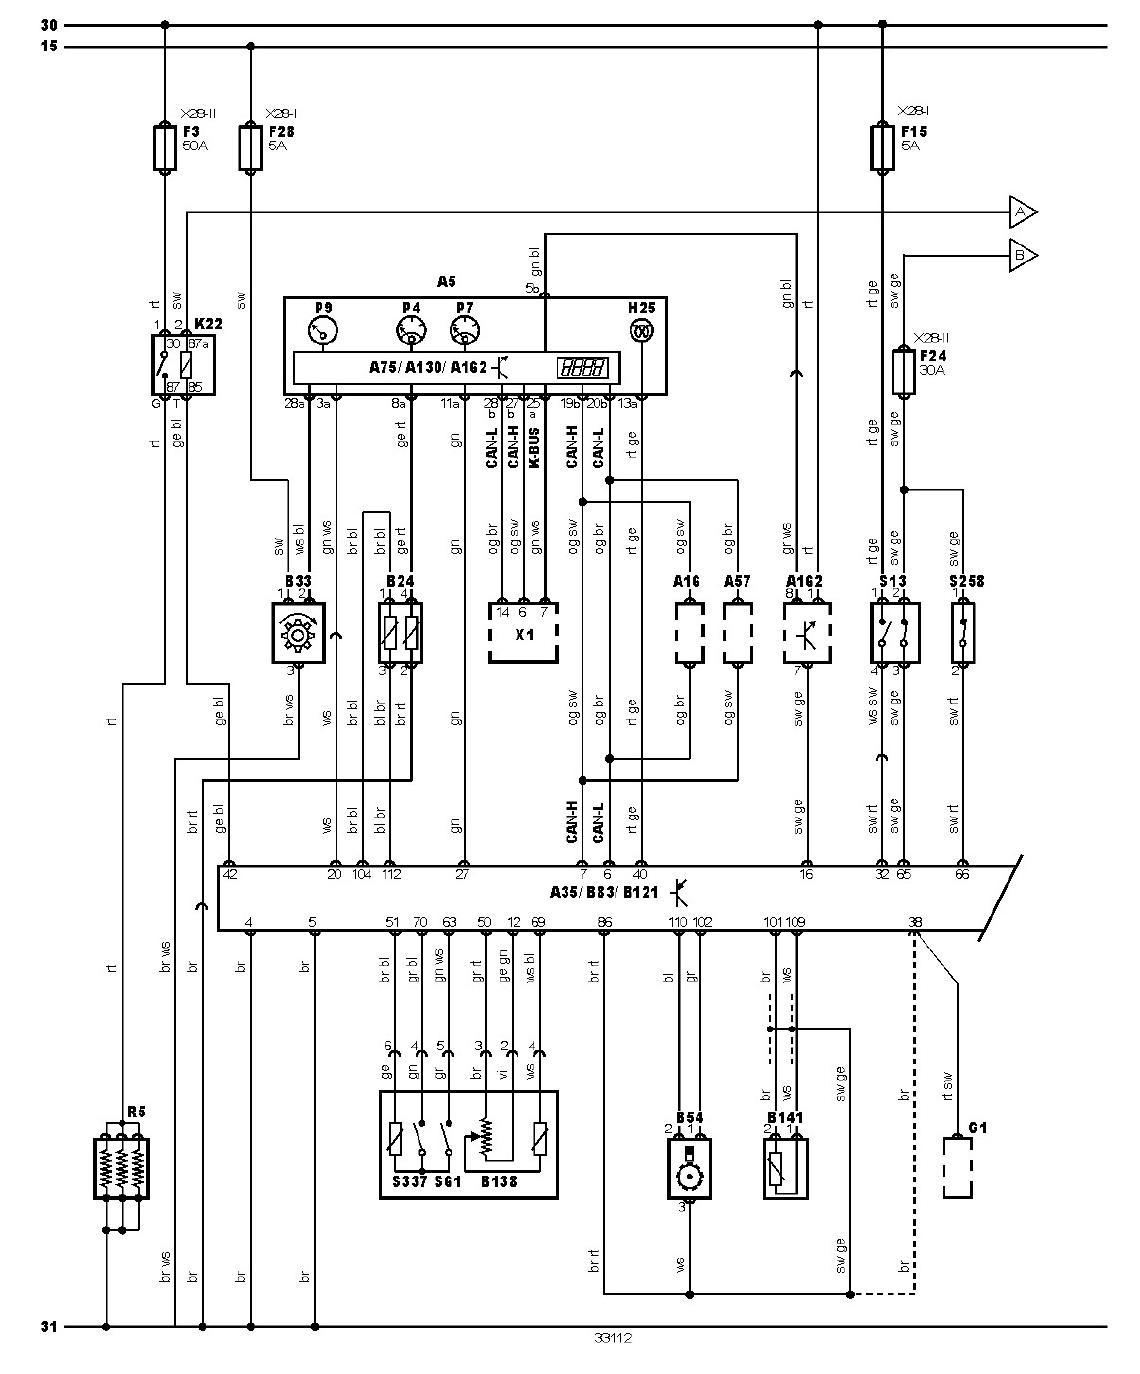 Diagram Wiring Diagram Vw Lupo Full Version Hd Quality Vw Lupo Diagramlarryg Portaimprese It